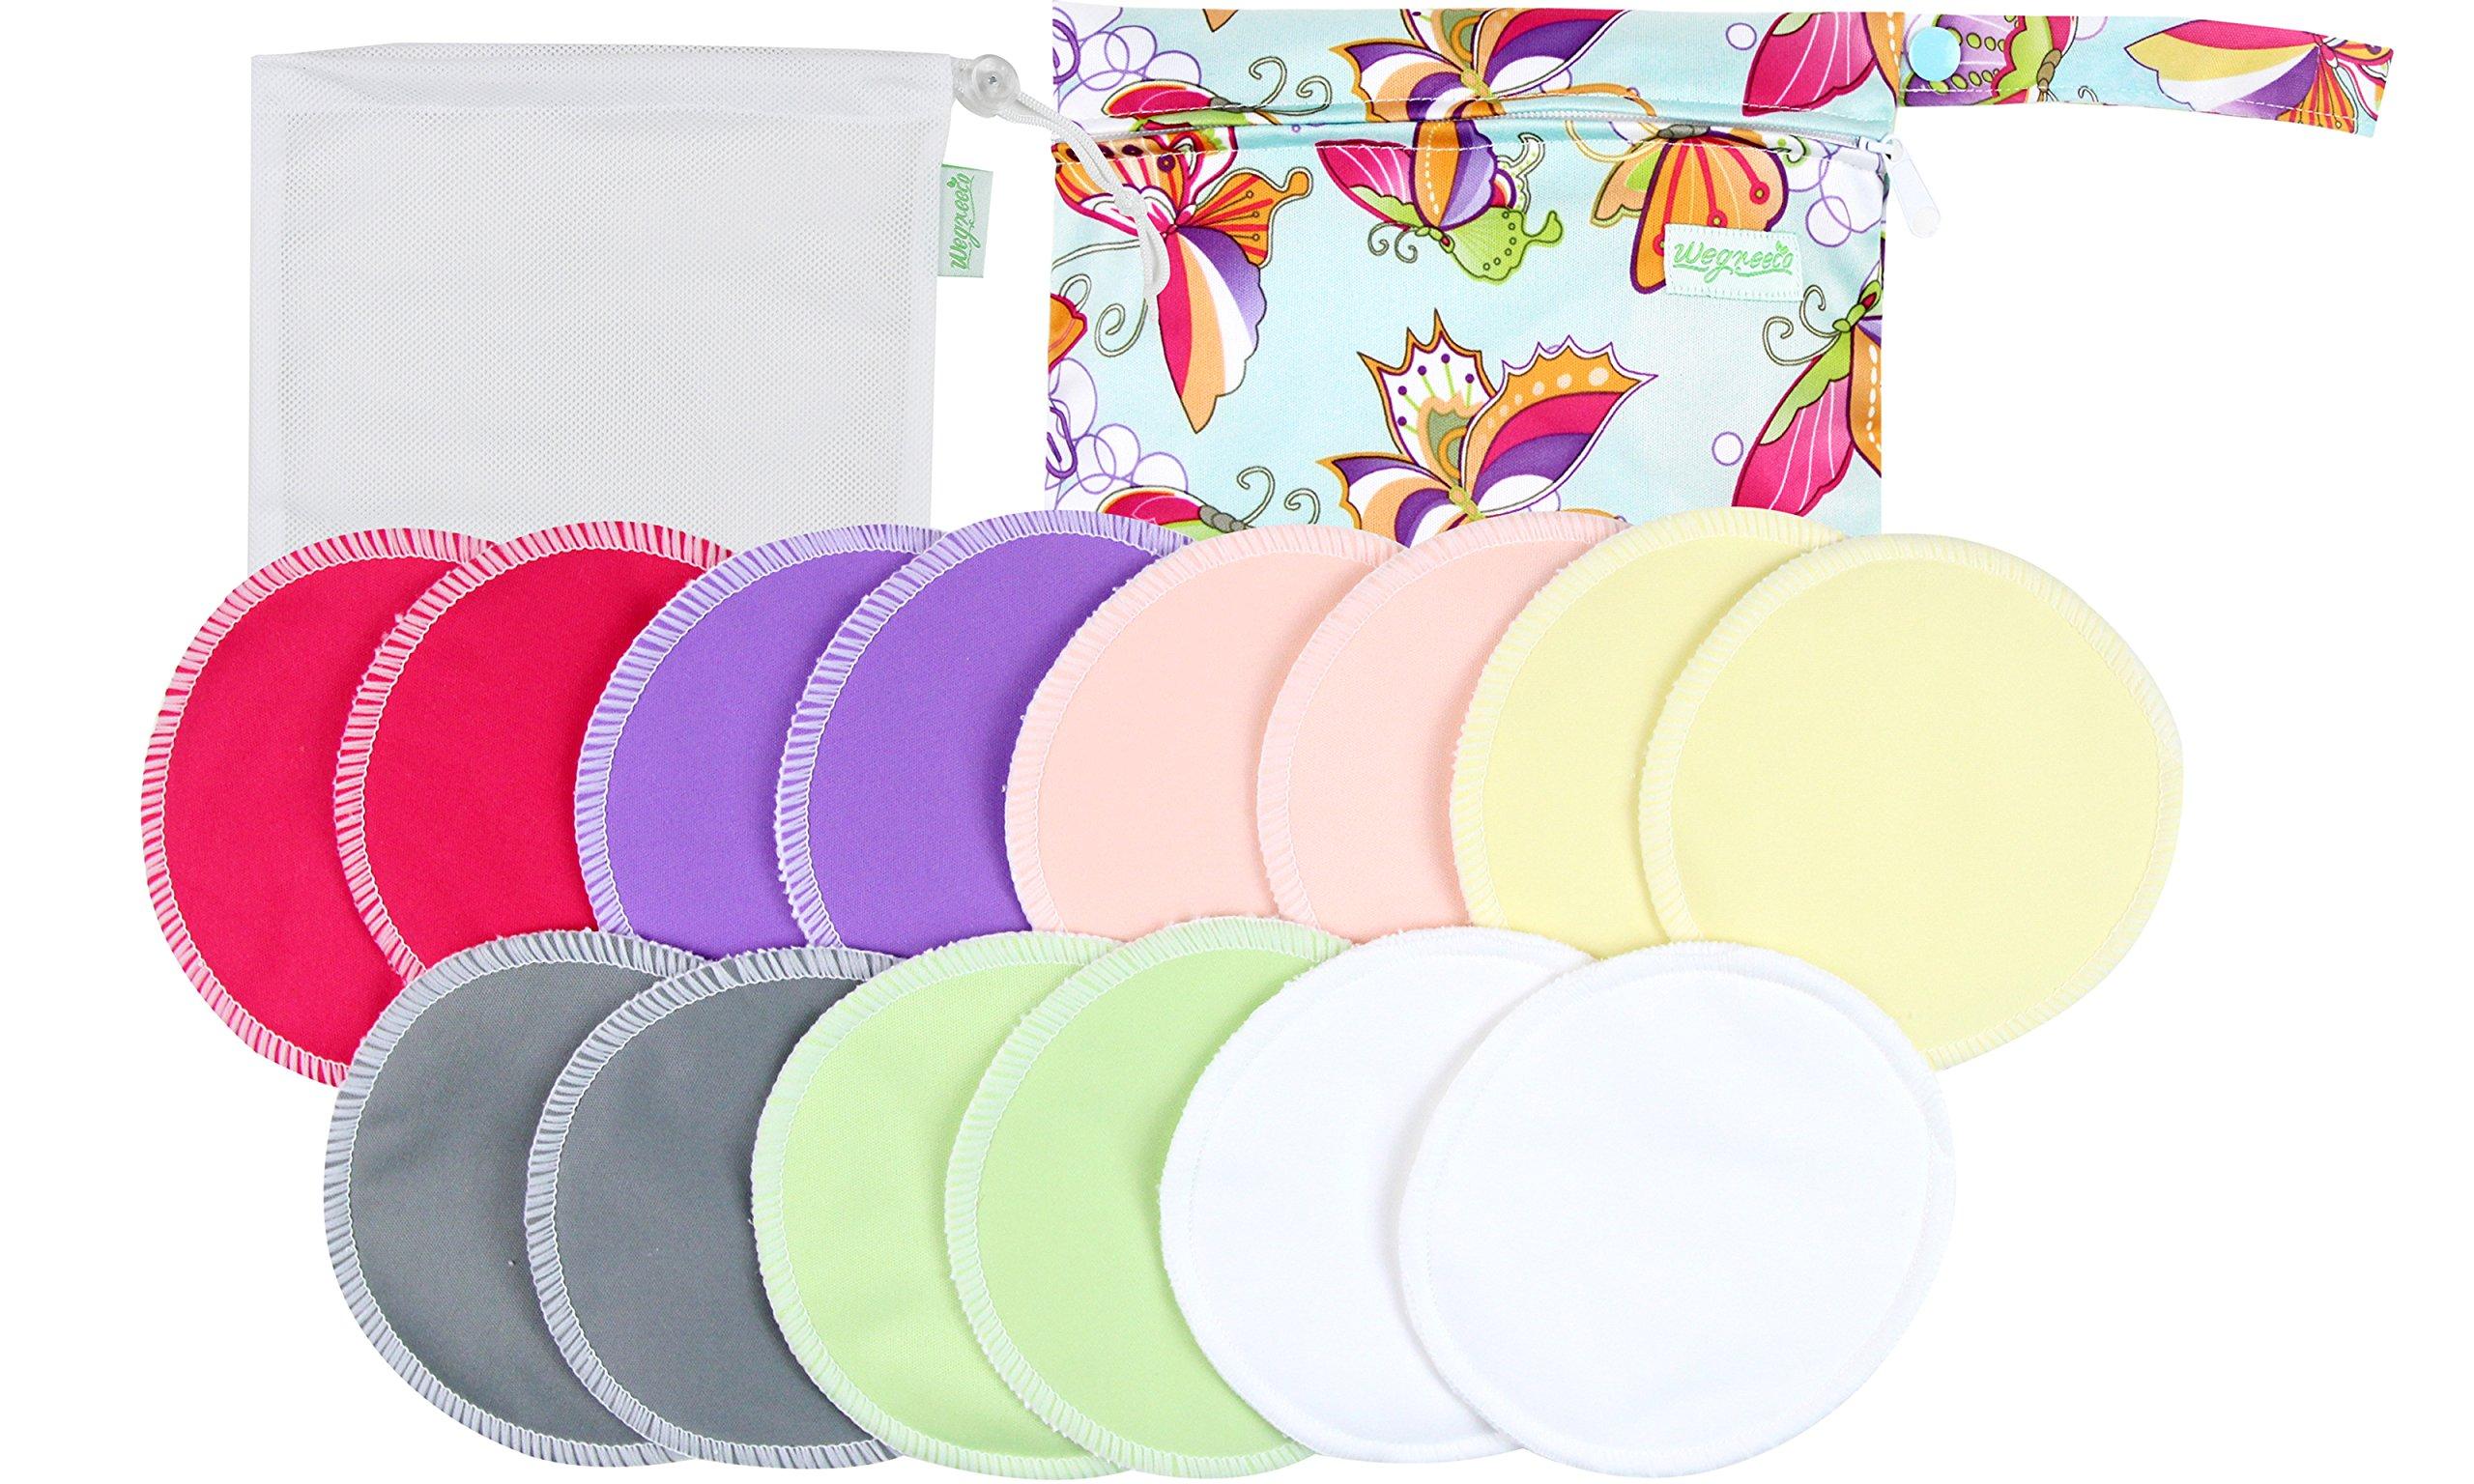 Organic Bamboo Nursing Pads (14 Pack)+Laundry Bag & Travel Bag,2 Sizes:3.9/4.7inch Option - Washable & Reusable Nursing Pads(Small, Daytime Use)